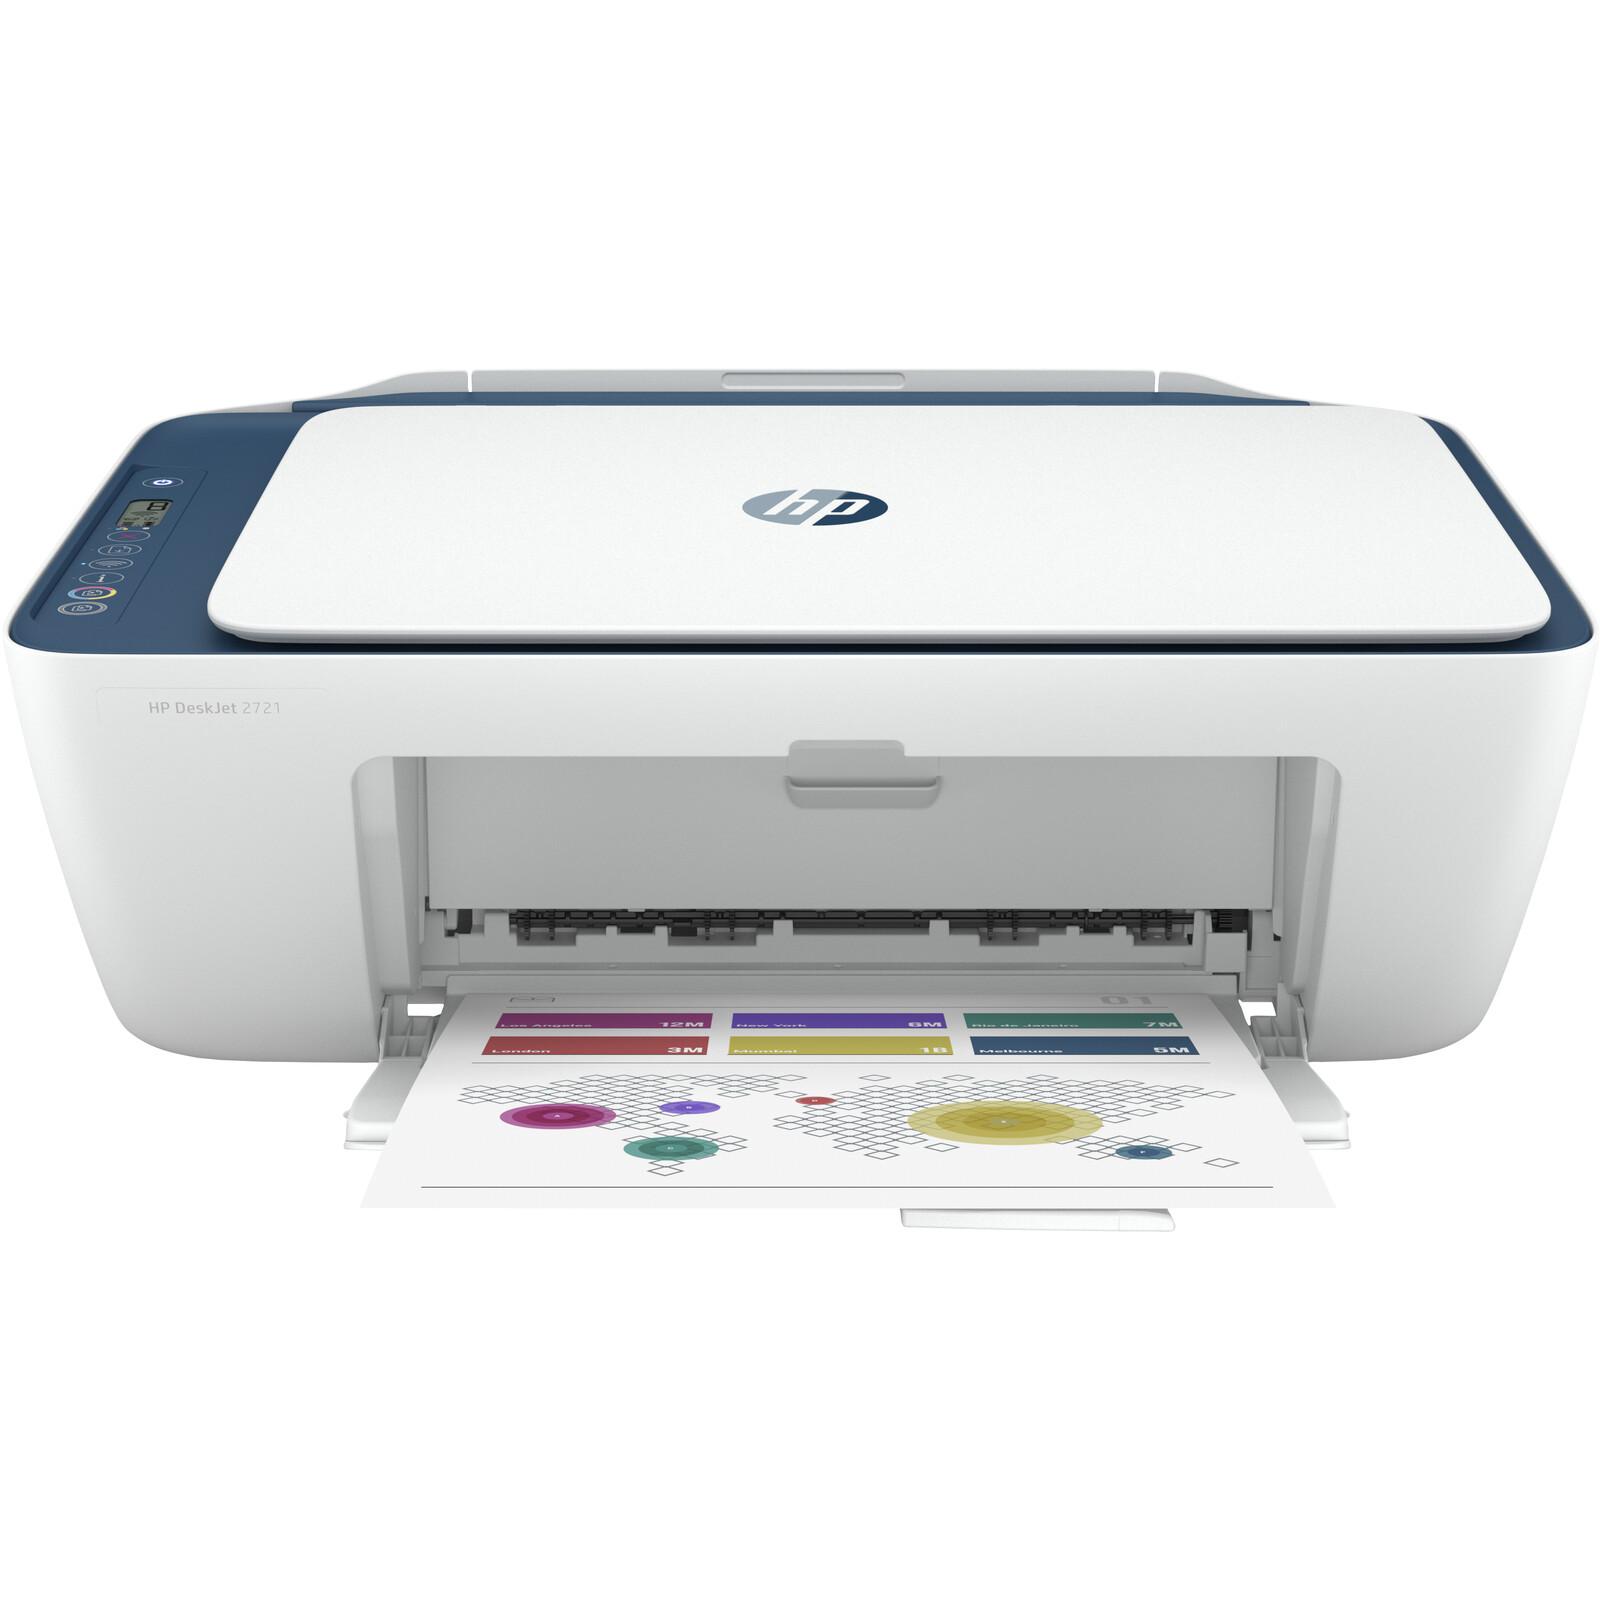 HP Deskjet 2721 All in One Drucker Drucken, Kopieren, Scan